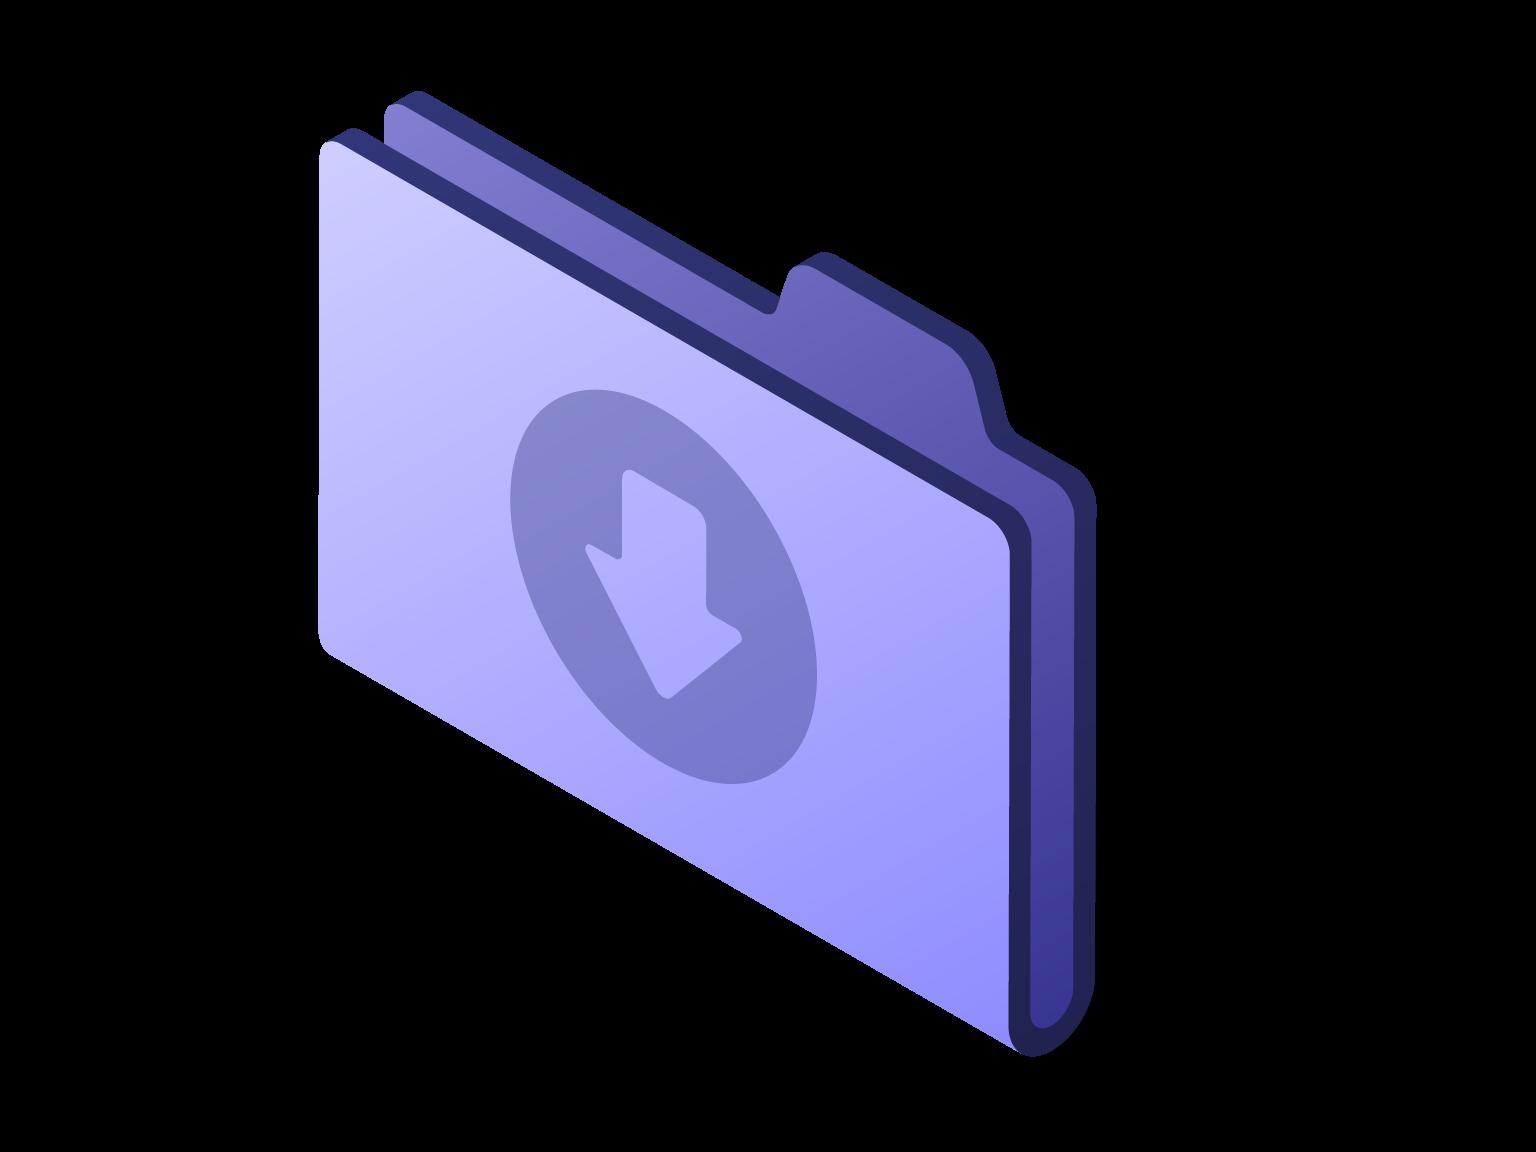 macOS 9 Classic Folders by Sveinn Davidsson on Dribbble